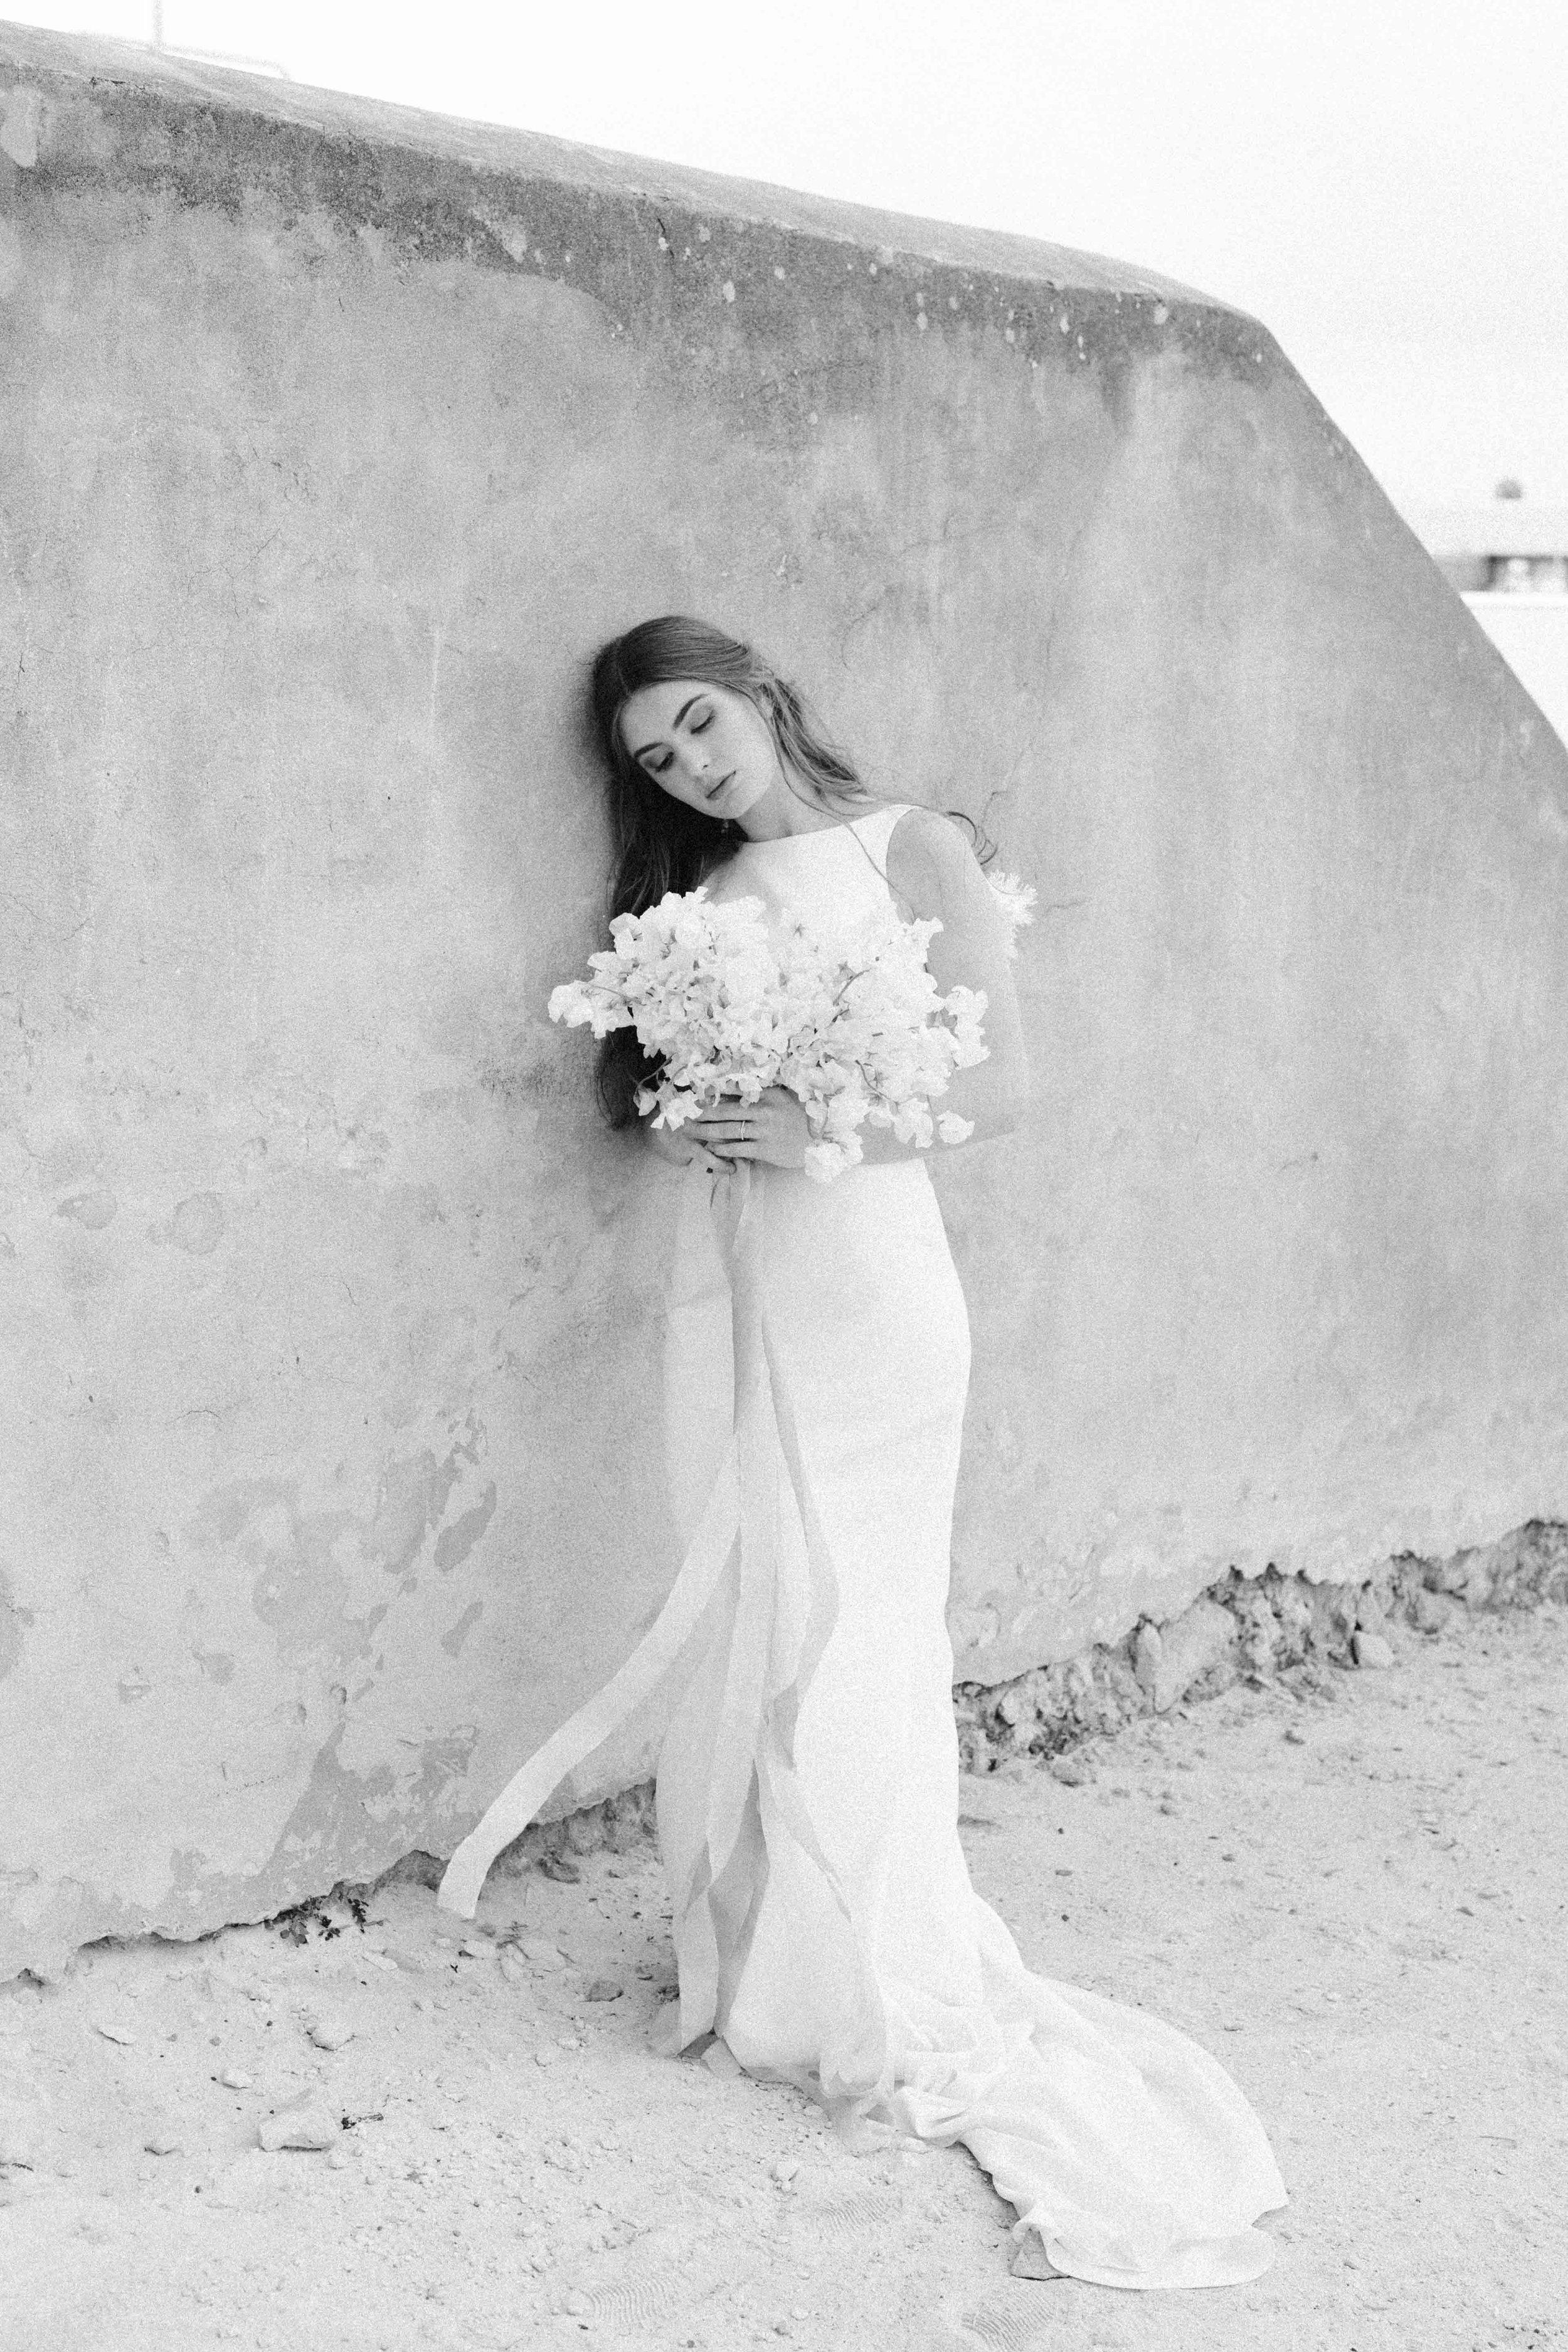 Fremantle Wedding Walk - Blue HQ, Perth Wedding Venue -  Tessa Kit Photography -JQ9A9239-3.jpg